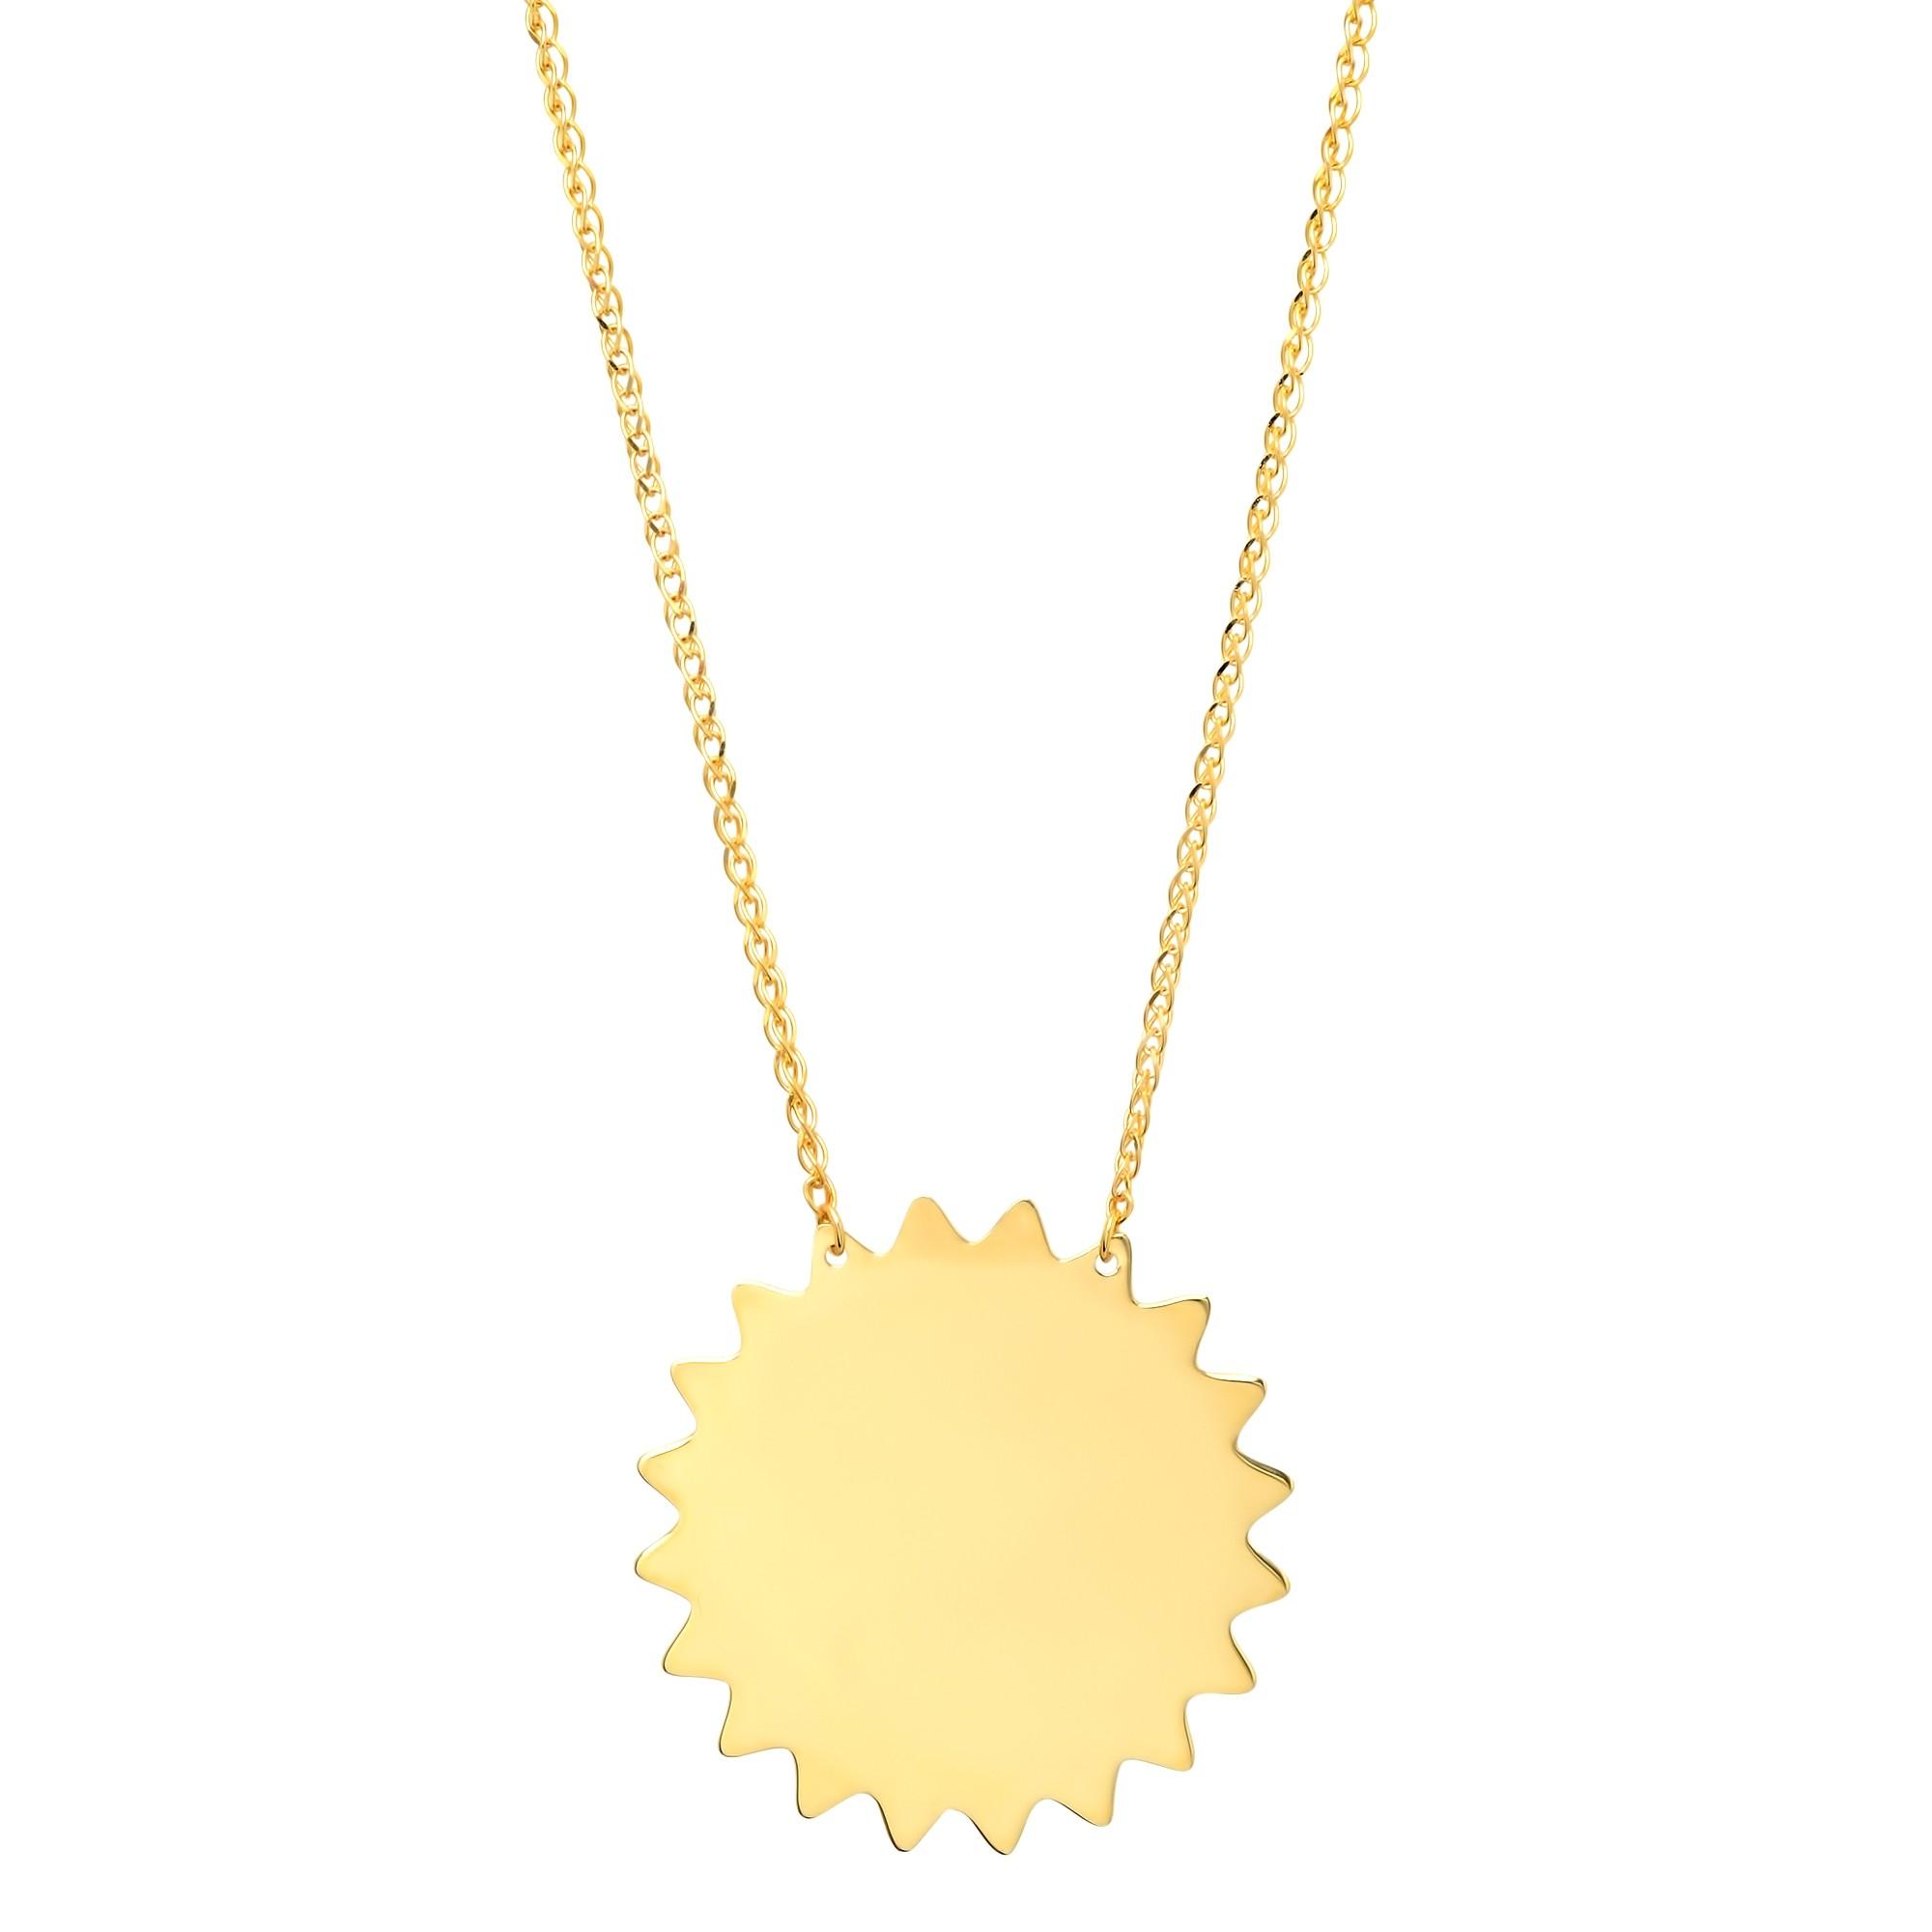 14k Yellow Gold Sunshine Necklace